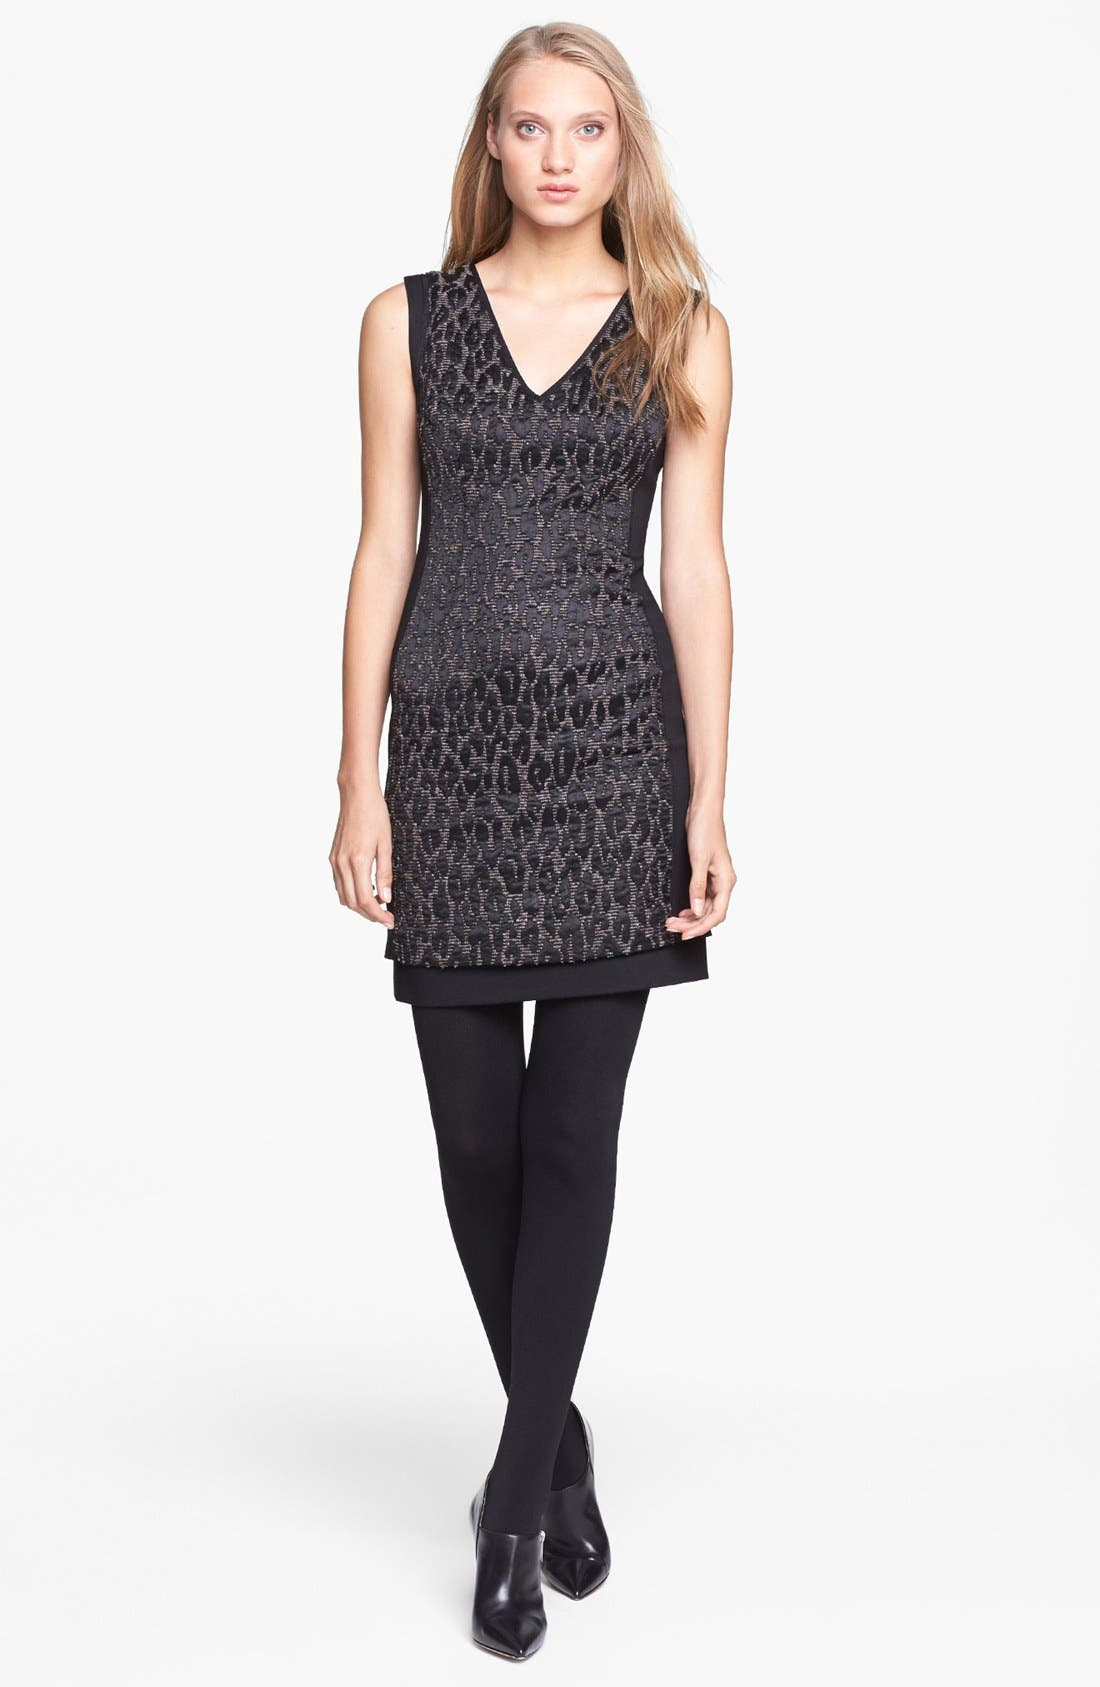 Alternate Image 1 Selected - Trina Turk 'Sharise' Jacquard Sheath Dress